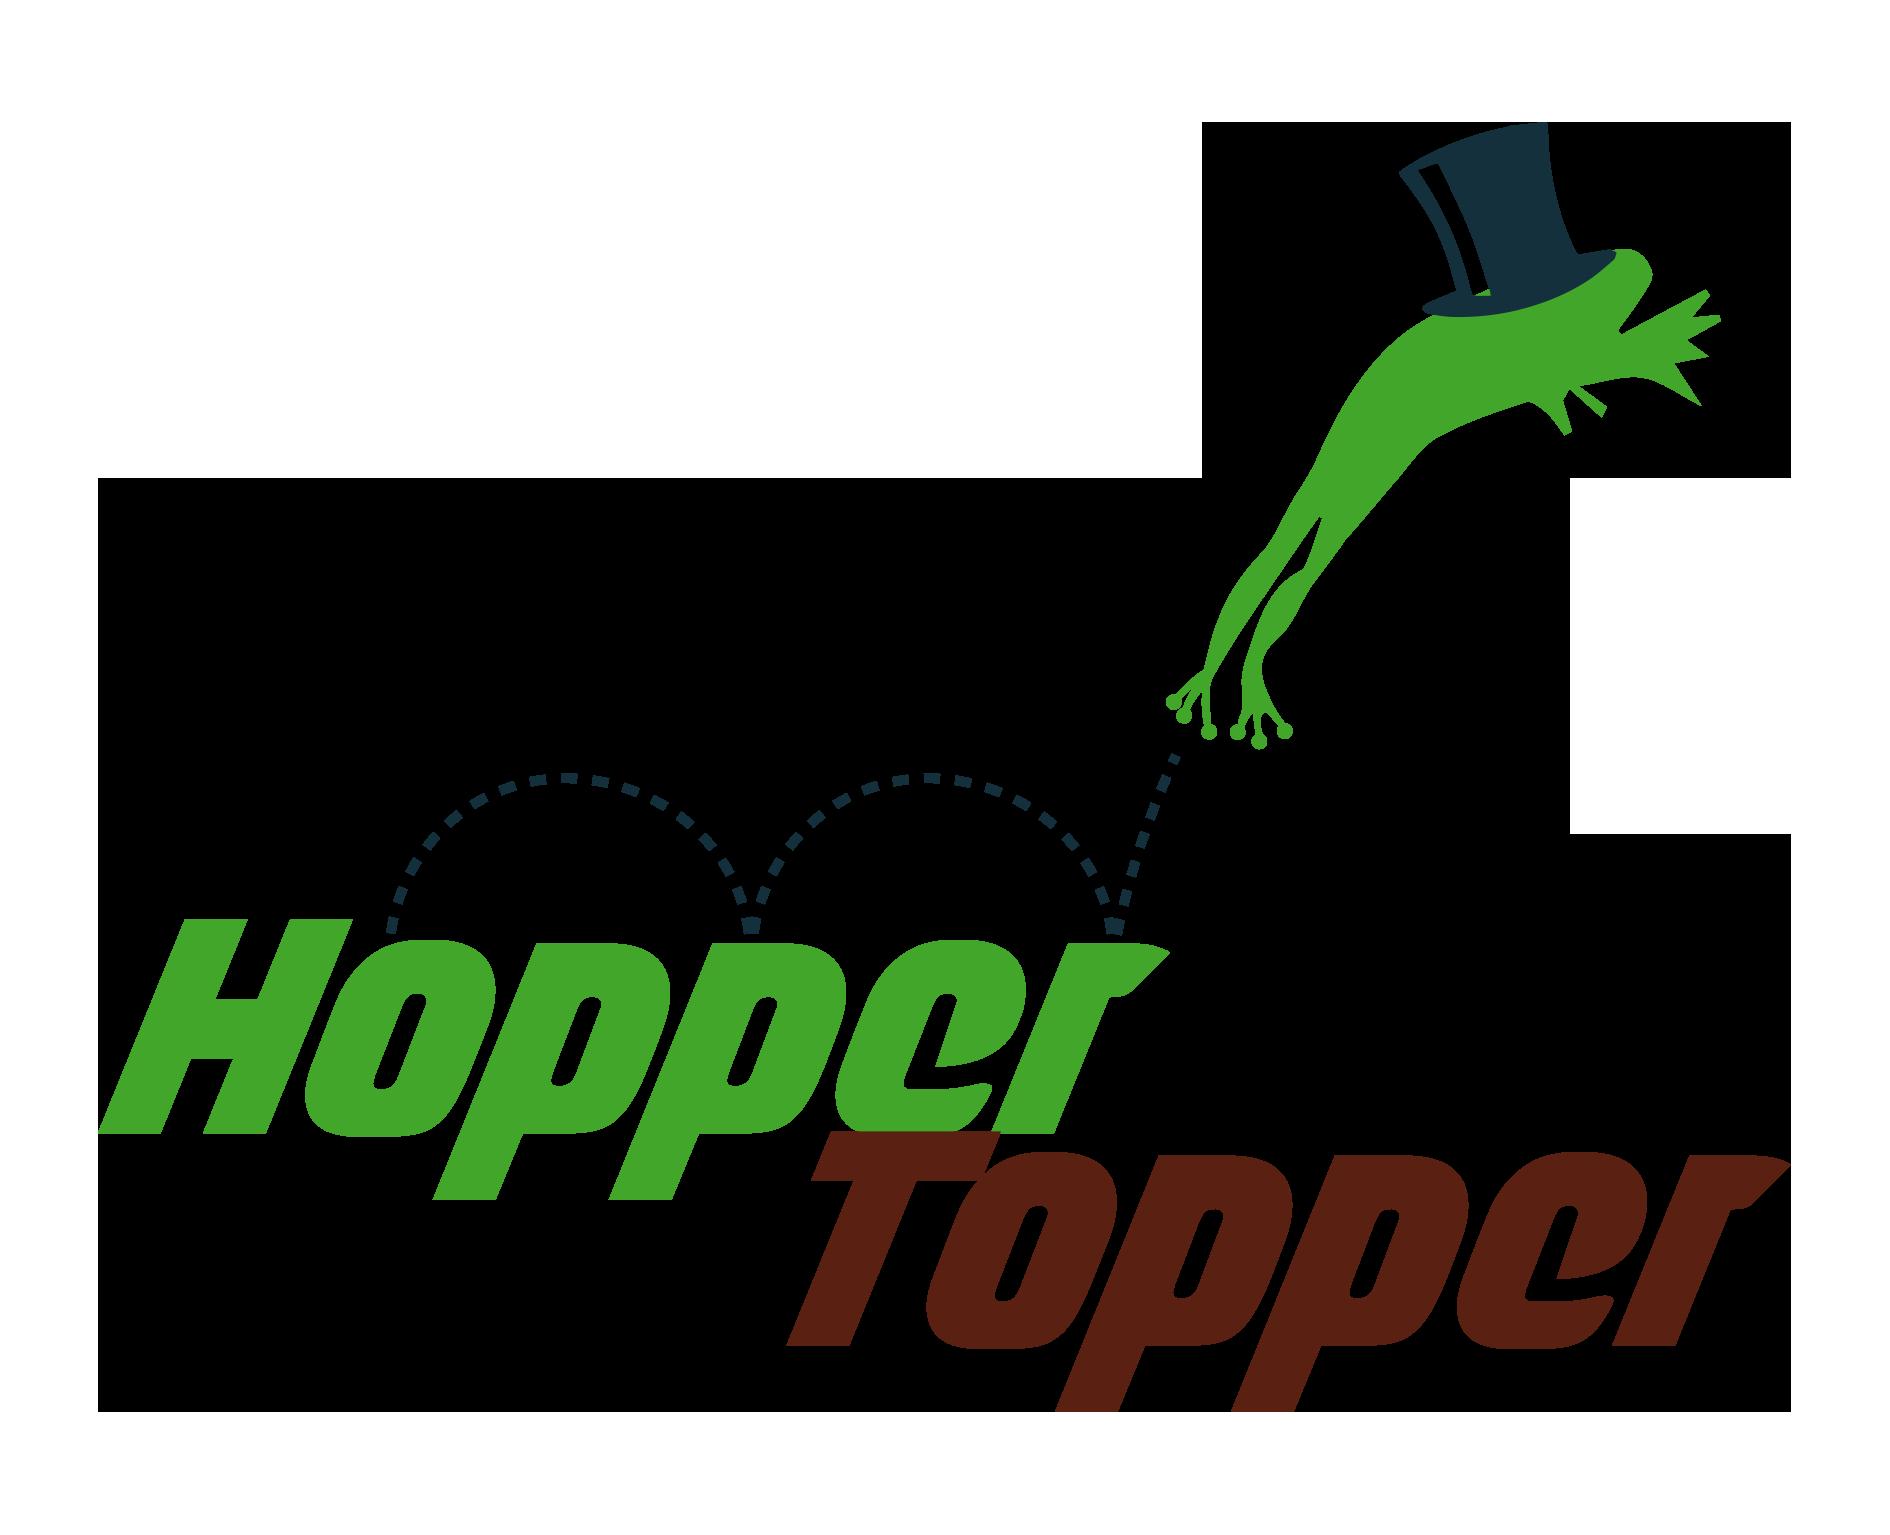 Andy---Logo-Hopper-Topper-final-color